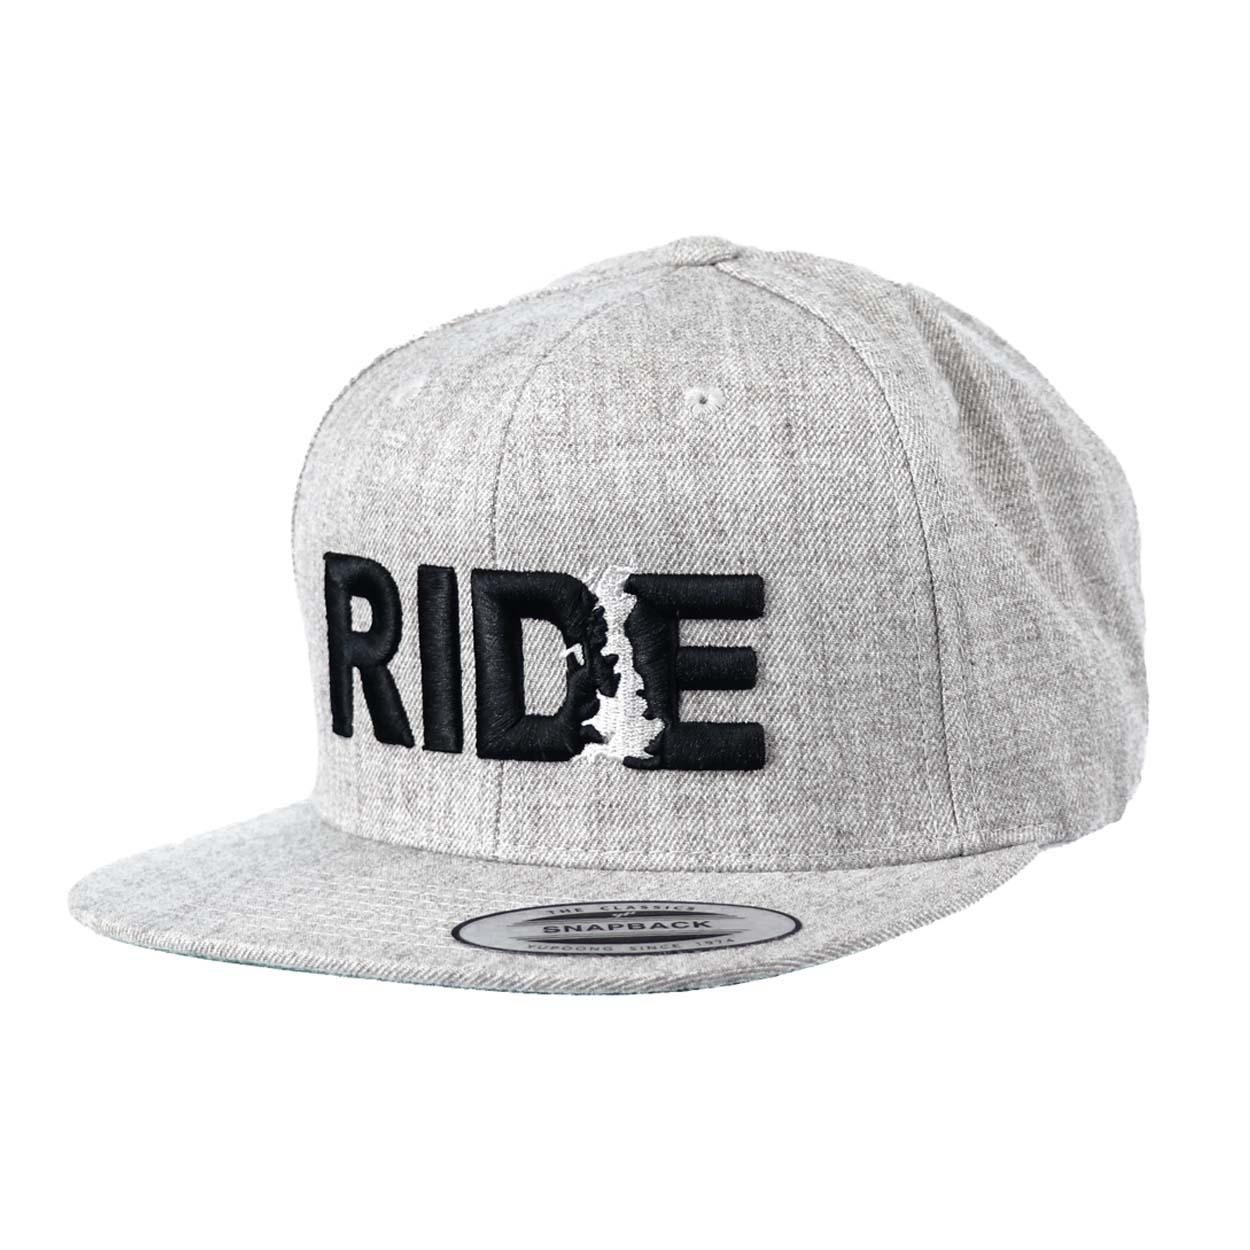 Ride United Kingdom Classic Embroidered Snapback Flat Brim Hat Gray/Black